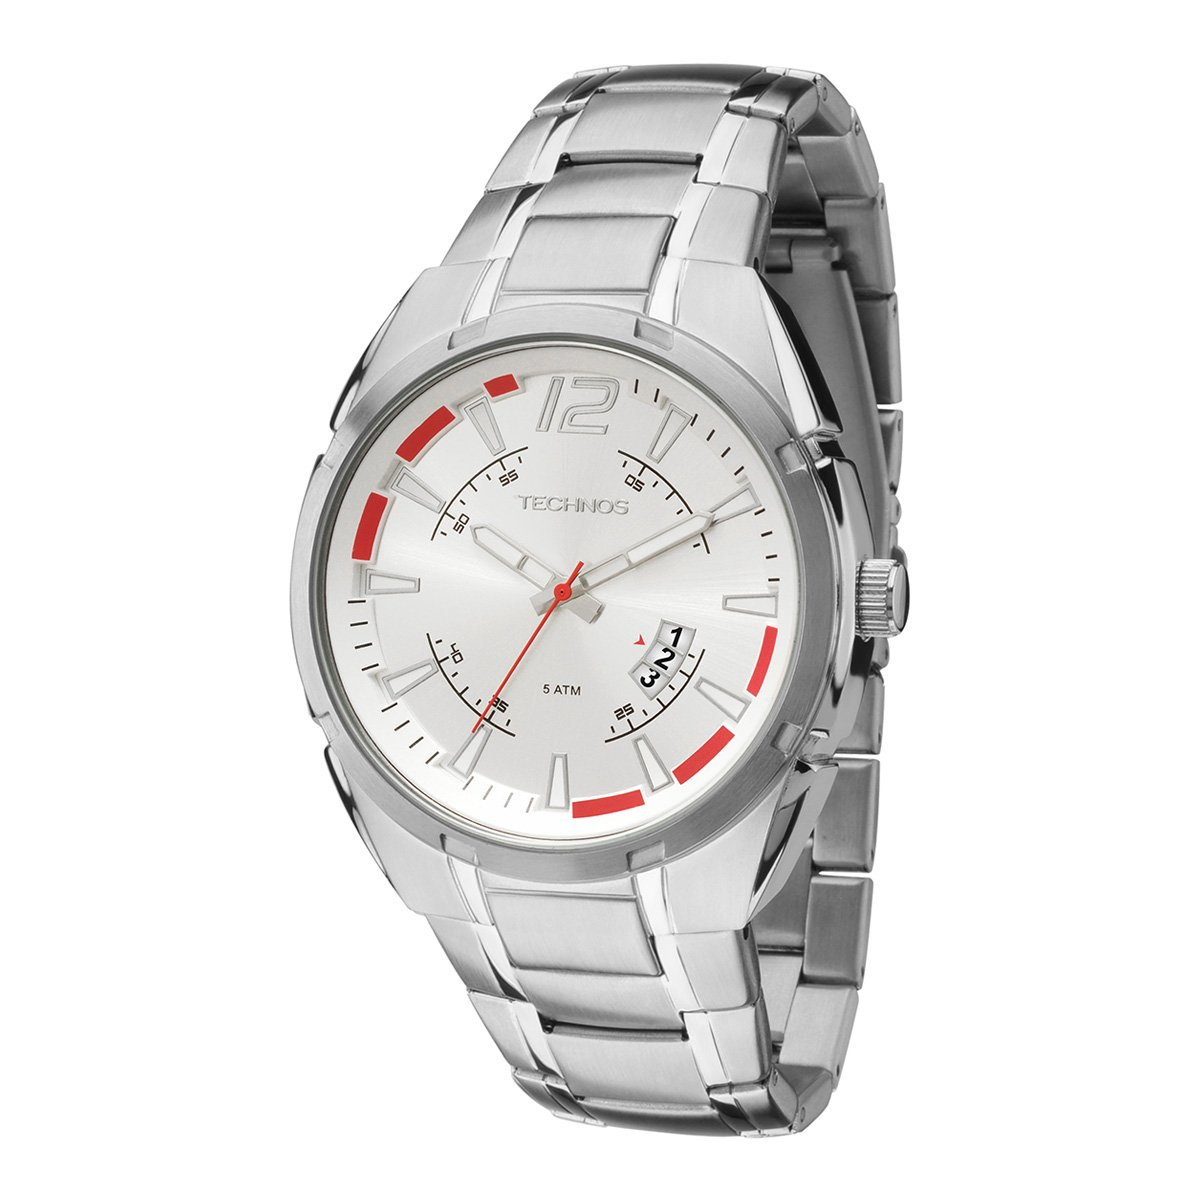 1ca24916e5d Relógio Technos Masculino 2115KTD1K - Prata - Compre Agora